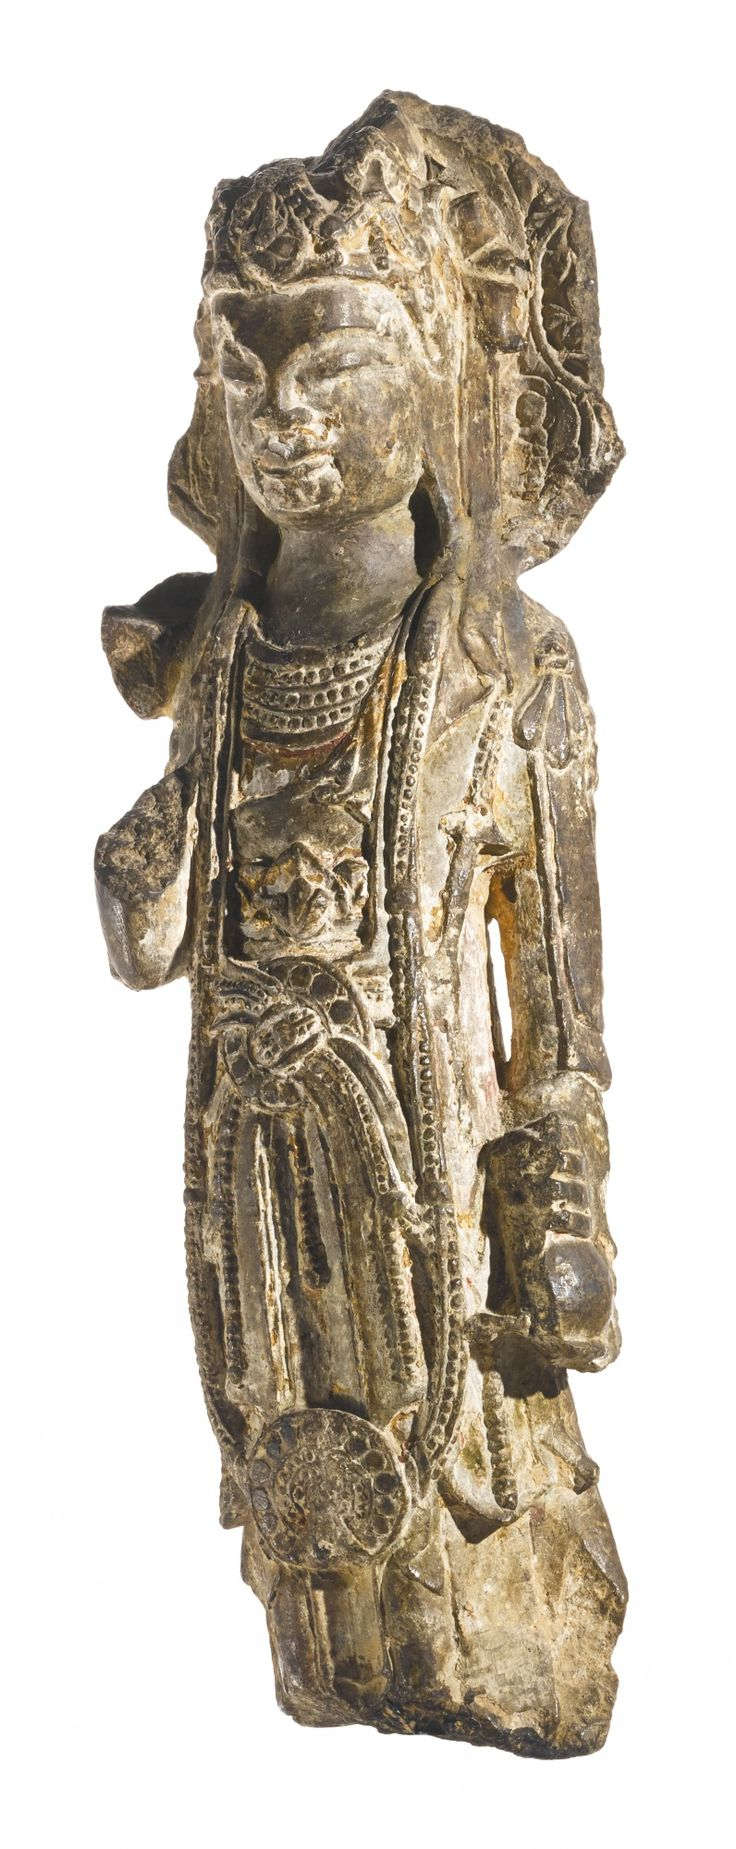 A stone figure of a bodhisattva, China, Sui Dynasty